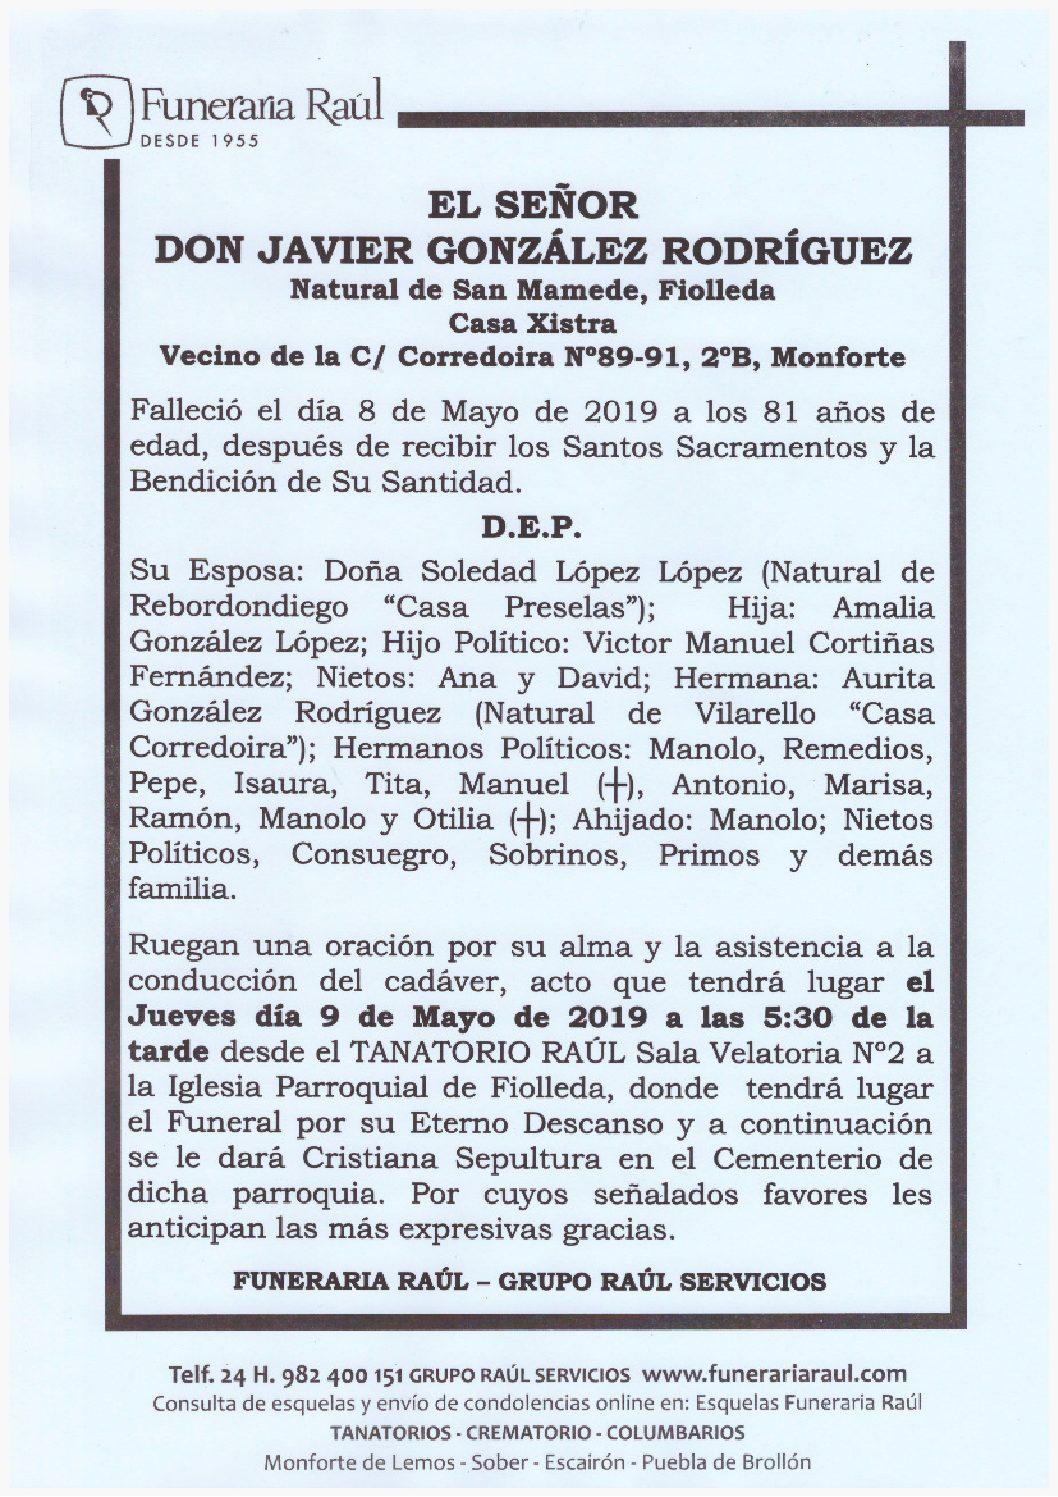 DON JAVIER GONZALEZ RODRIGUEZ